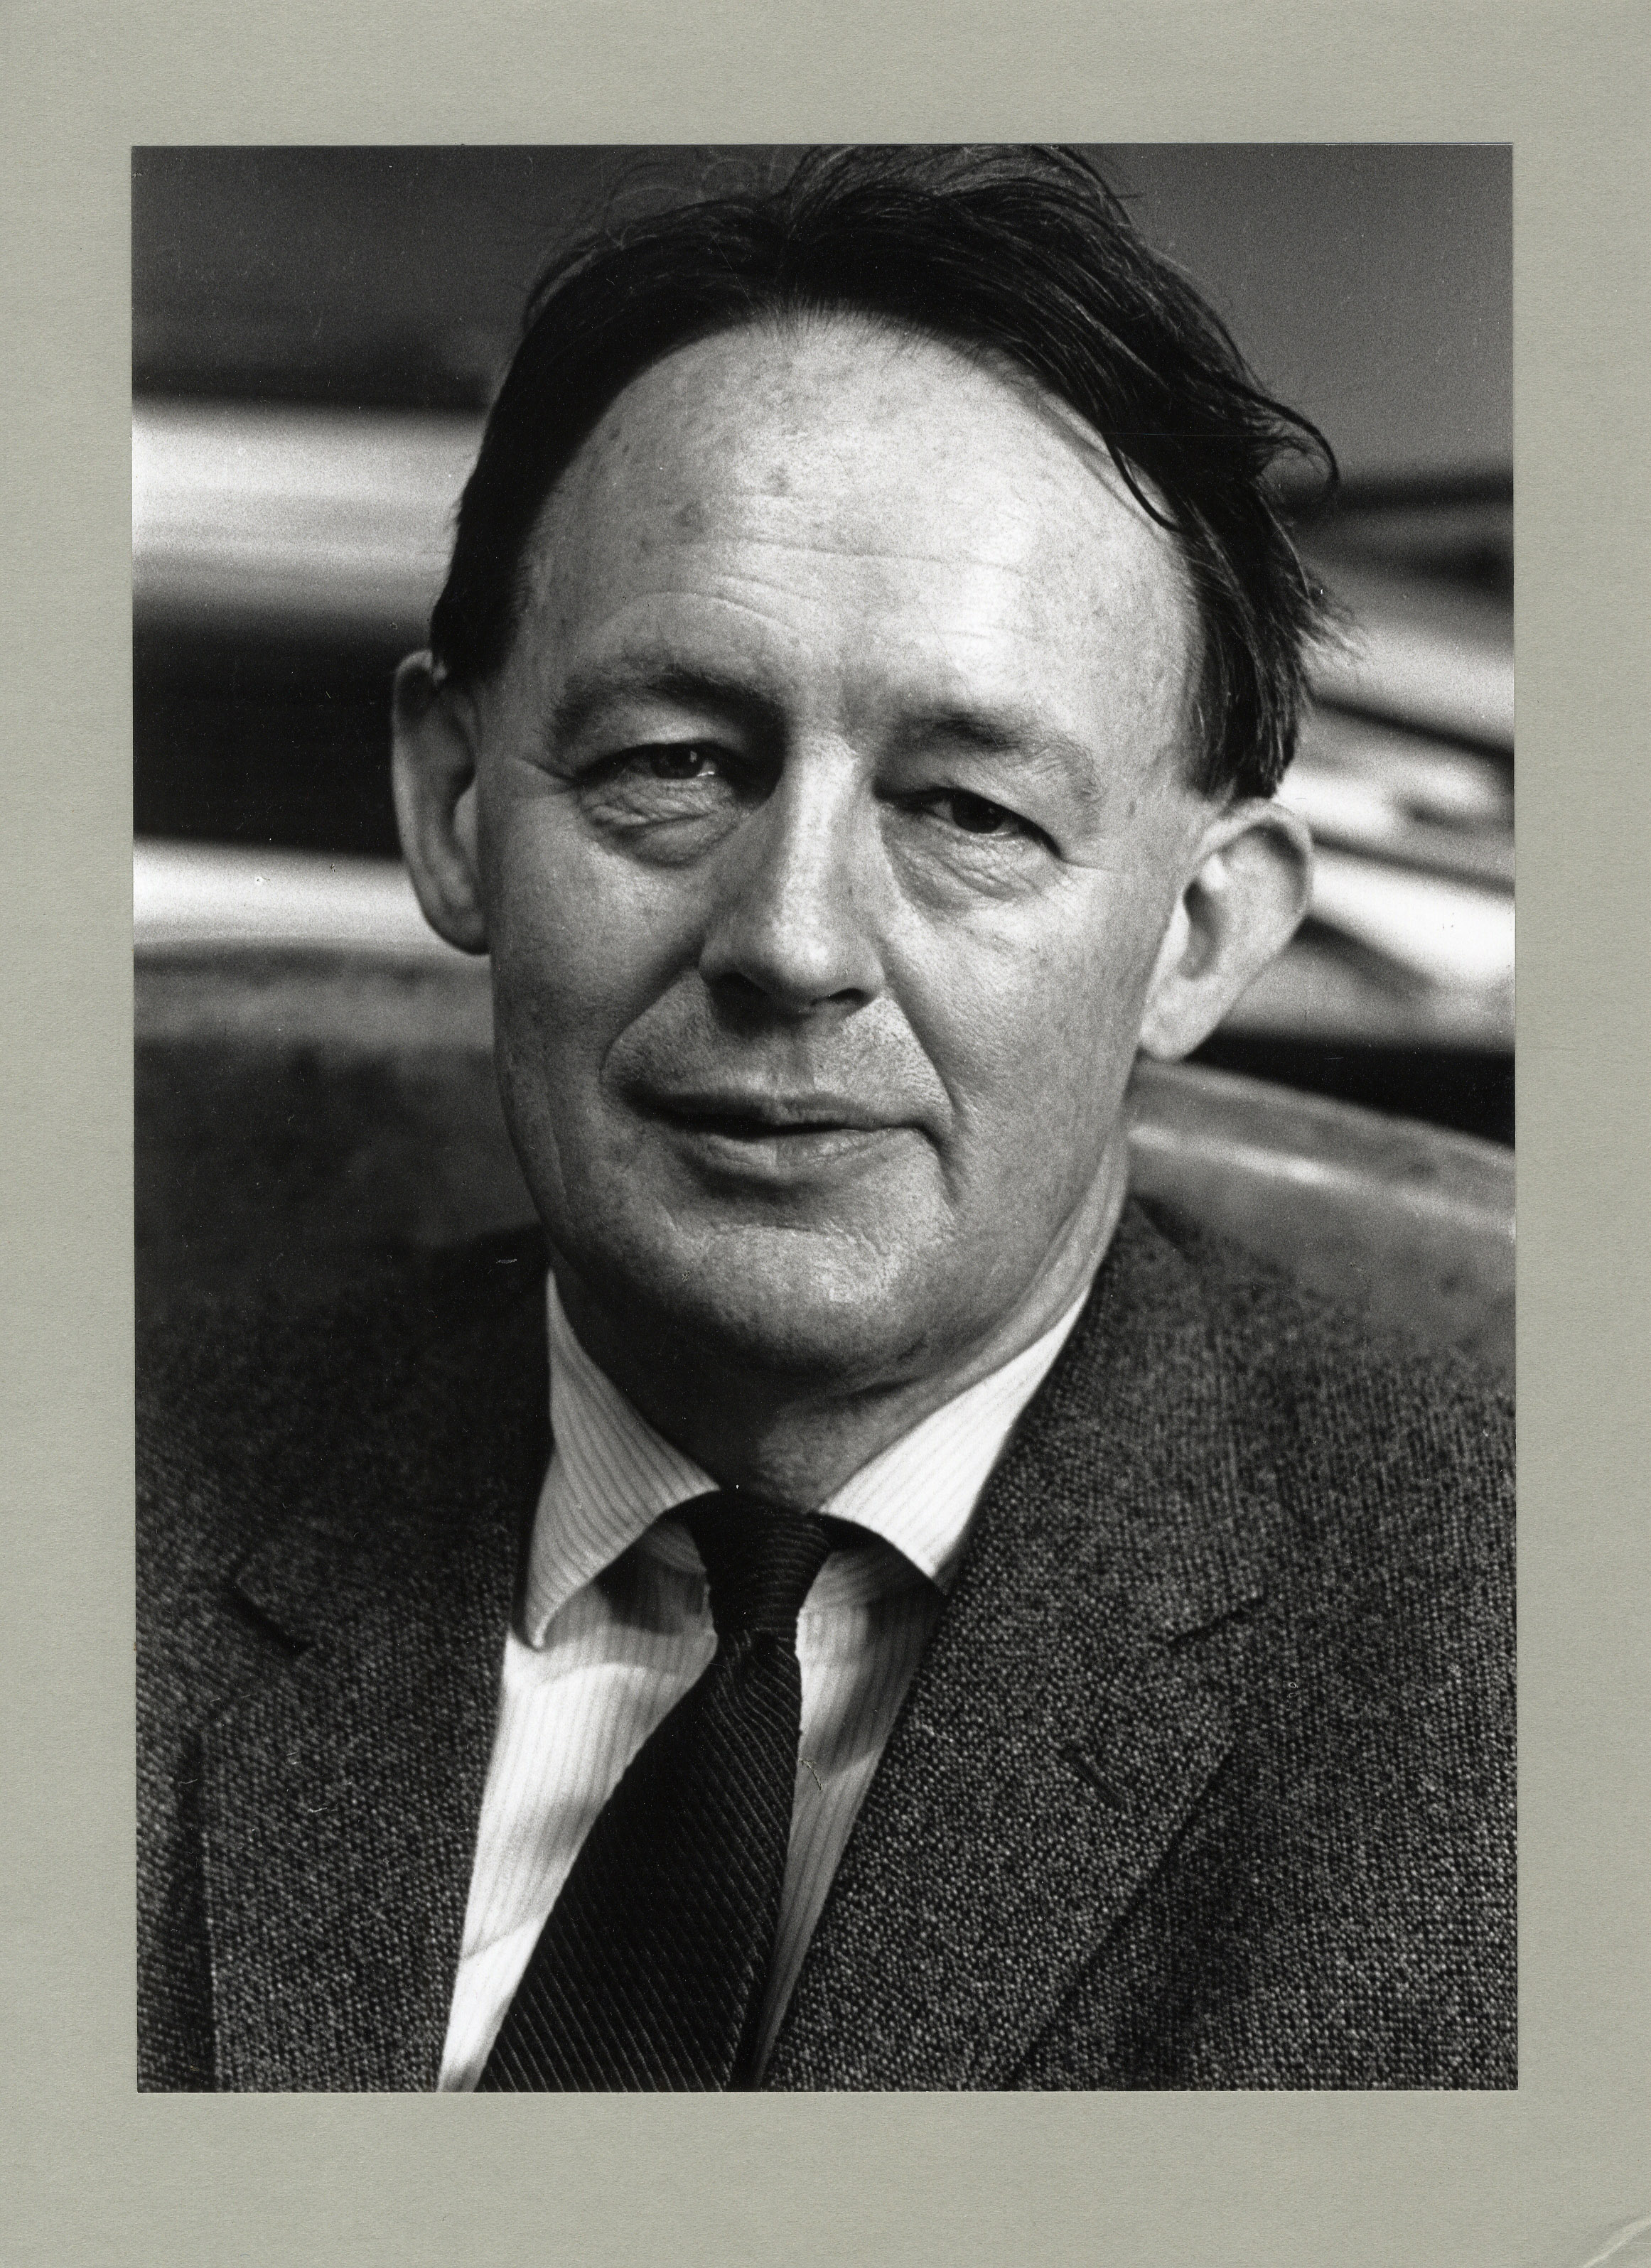 Edmund Leach, photograph taken by Robert Le Rougetel (Coll Photo 1312)